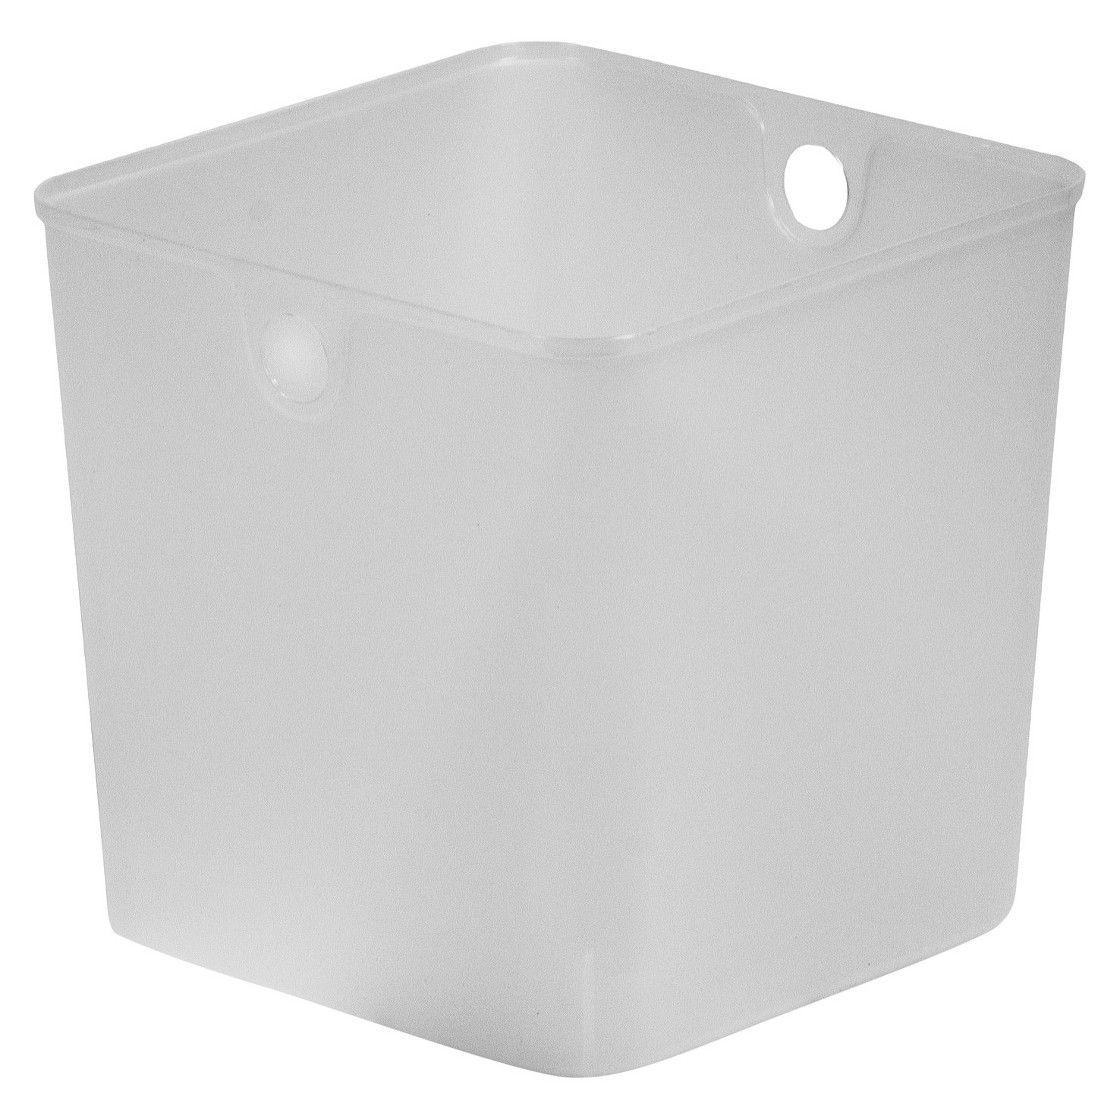 Room Essentials Plastic Cube Frost Cube Storage Bins Diy Cube Storage Storage Bins Diy